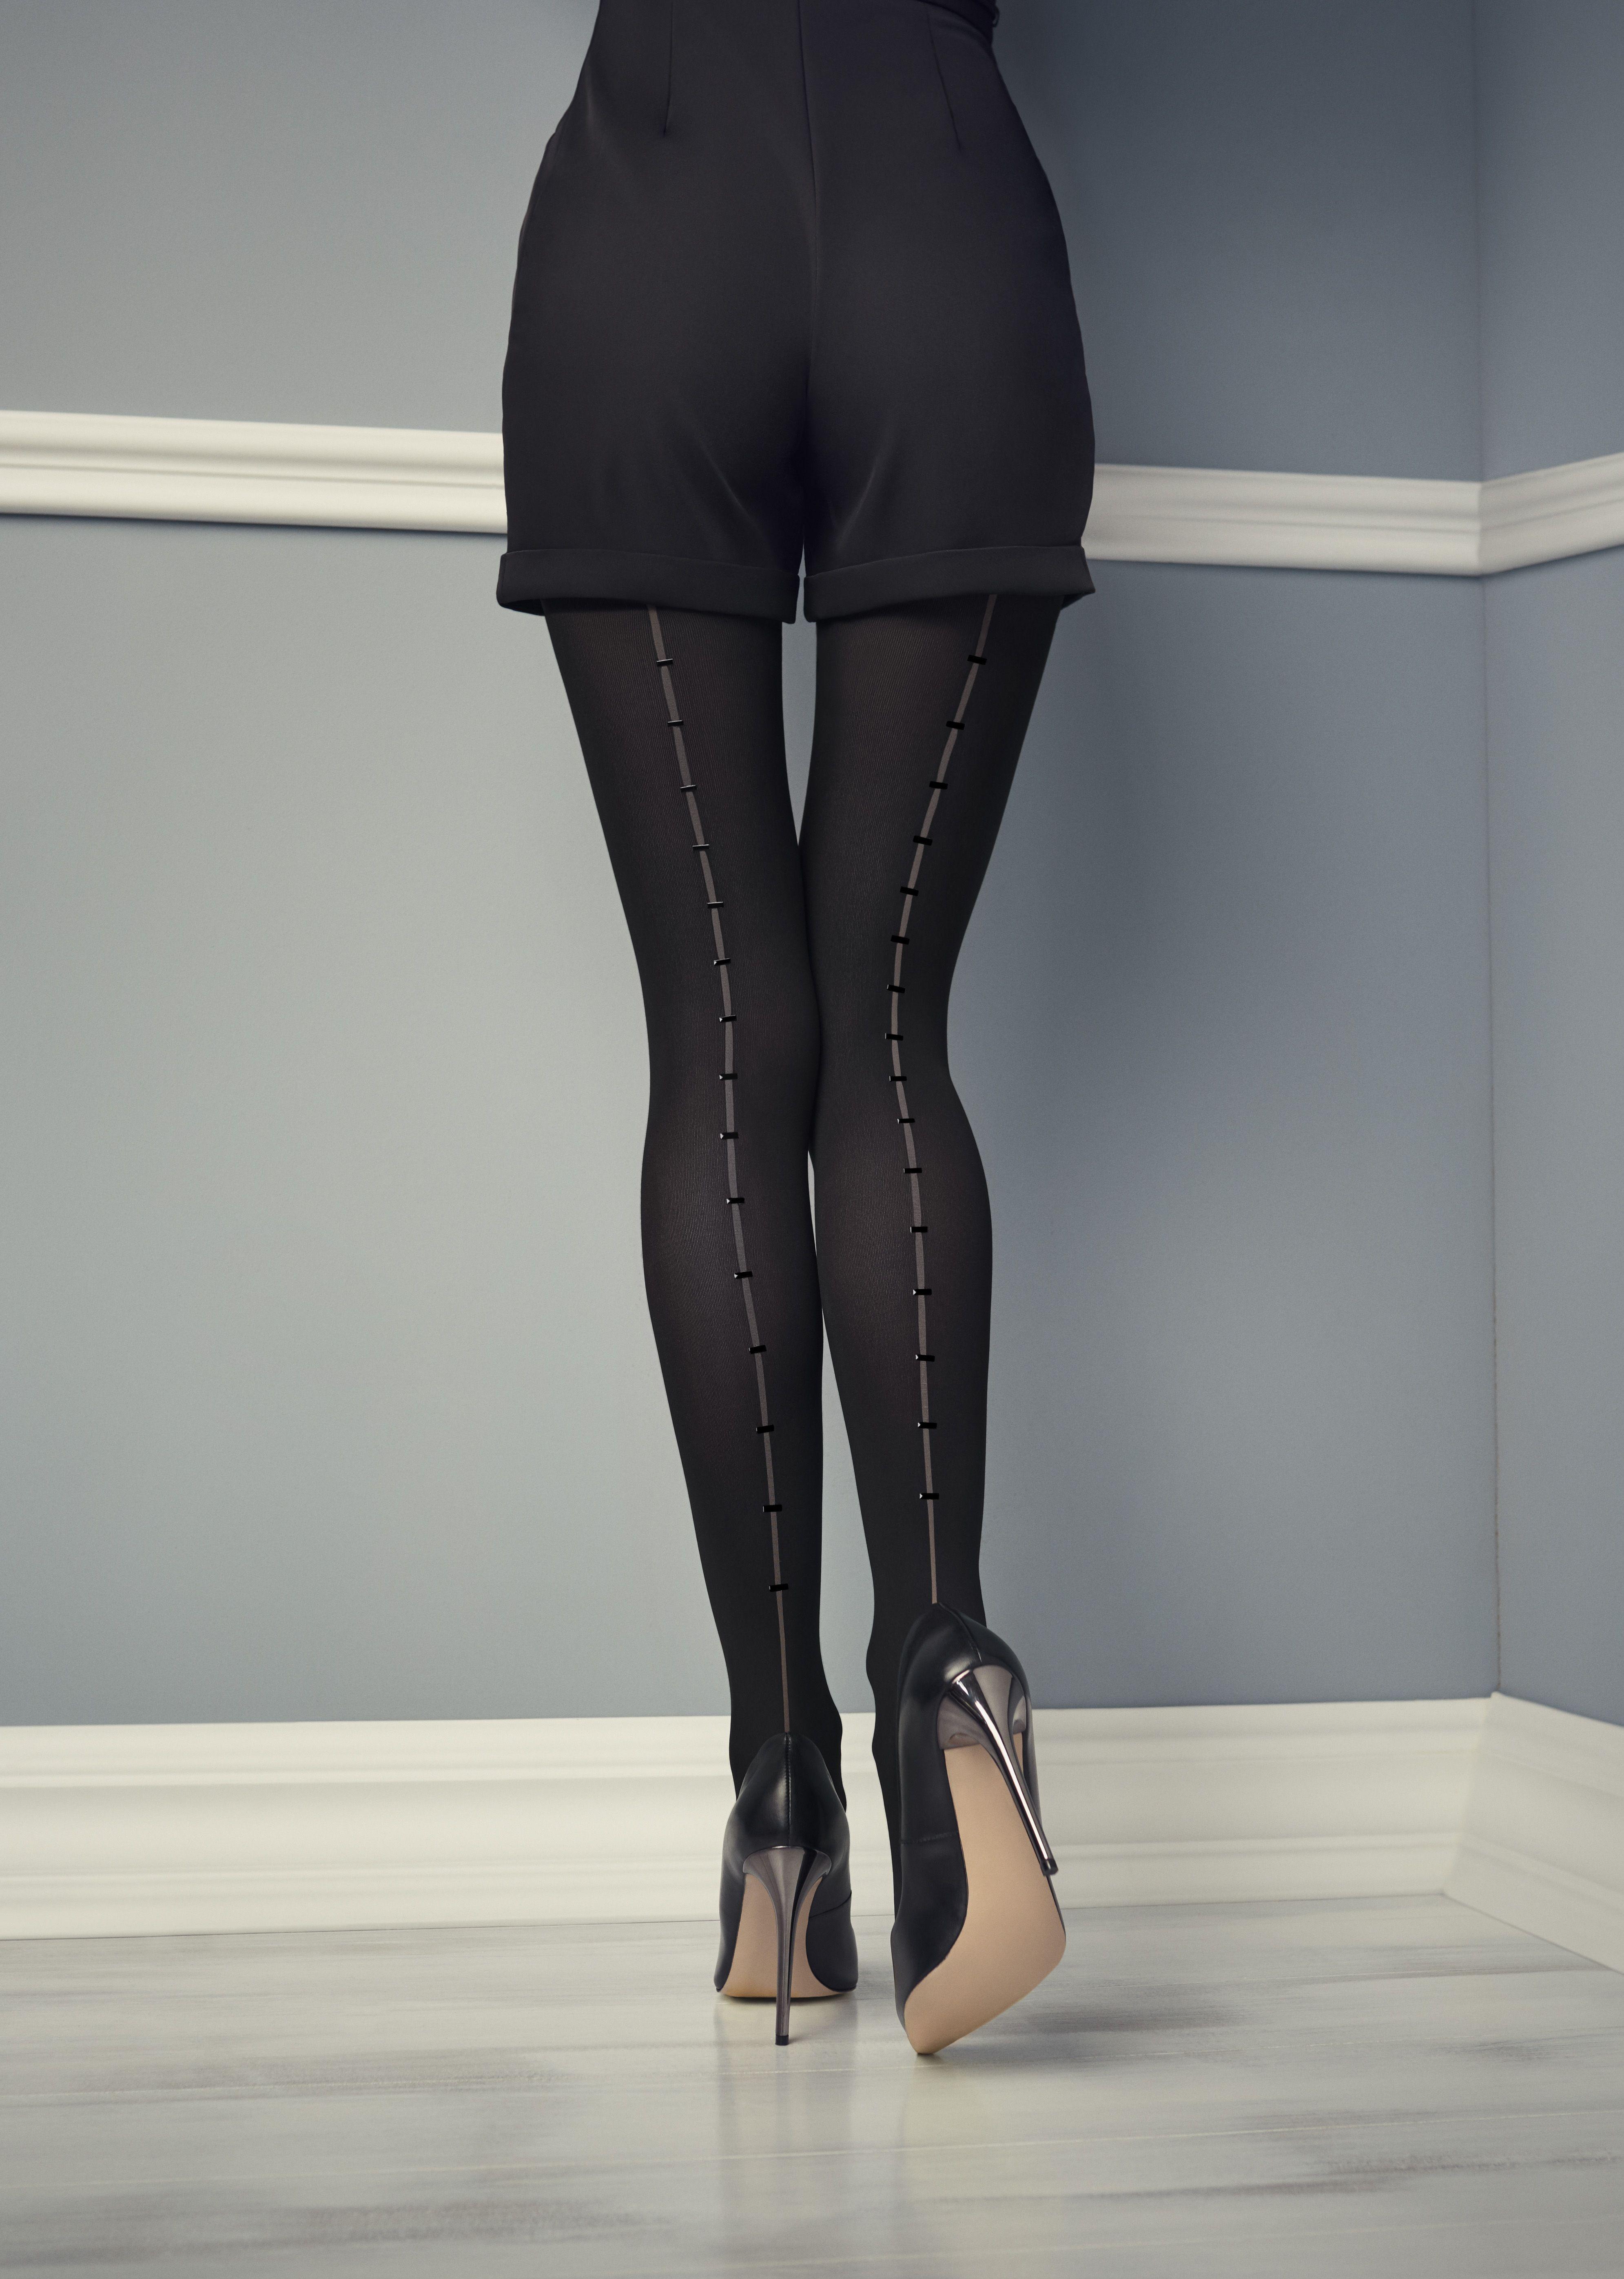 Black Retro style without elastic pure nylon fun slim flash stockings 0911